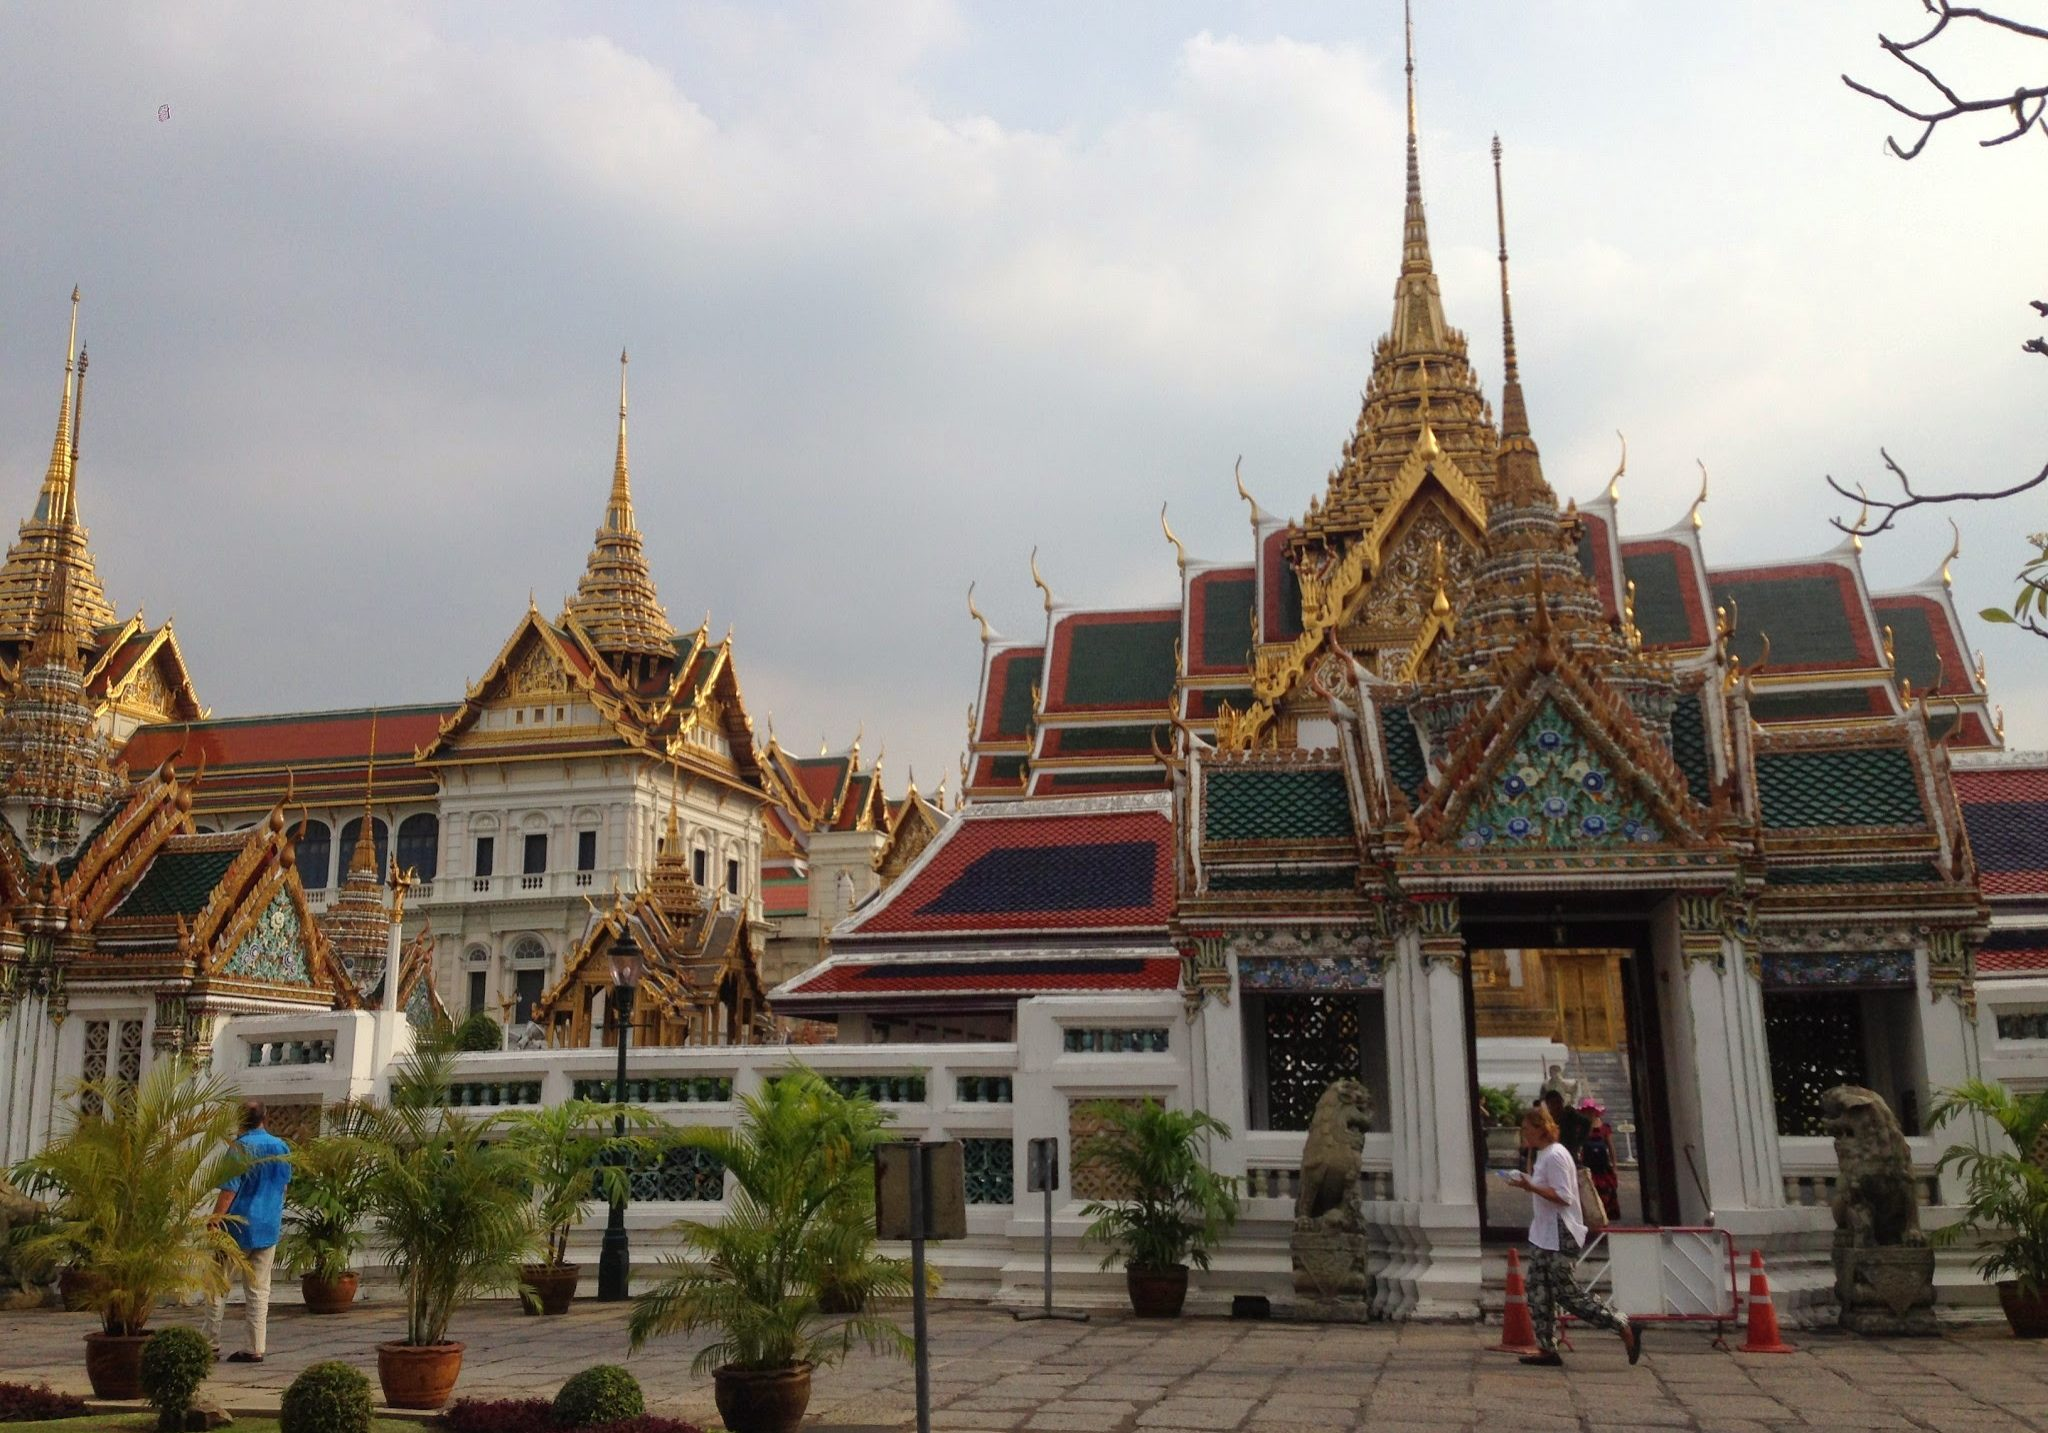 grand palace. bangkok, thailand, travels, backpacking, temple, temples, palace